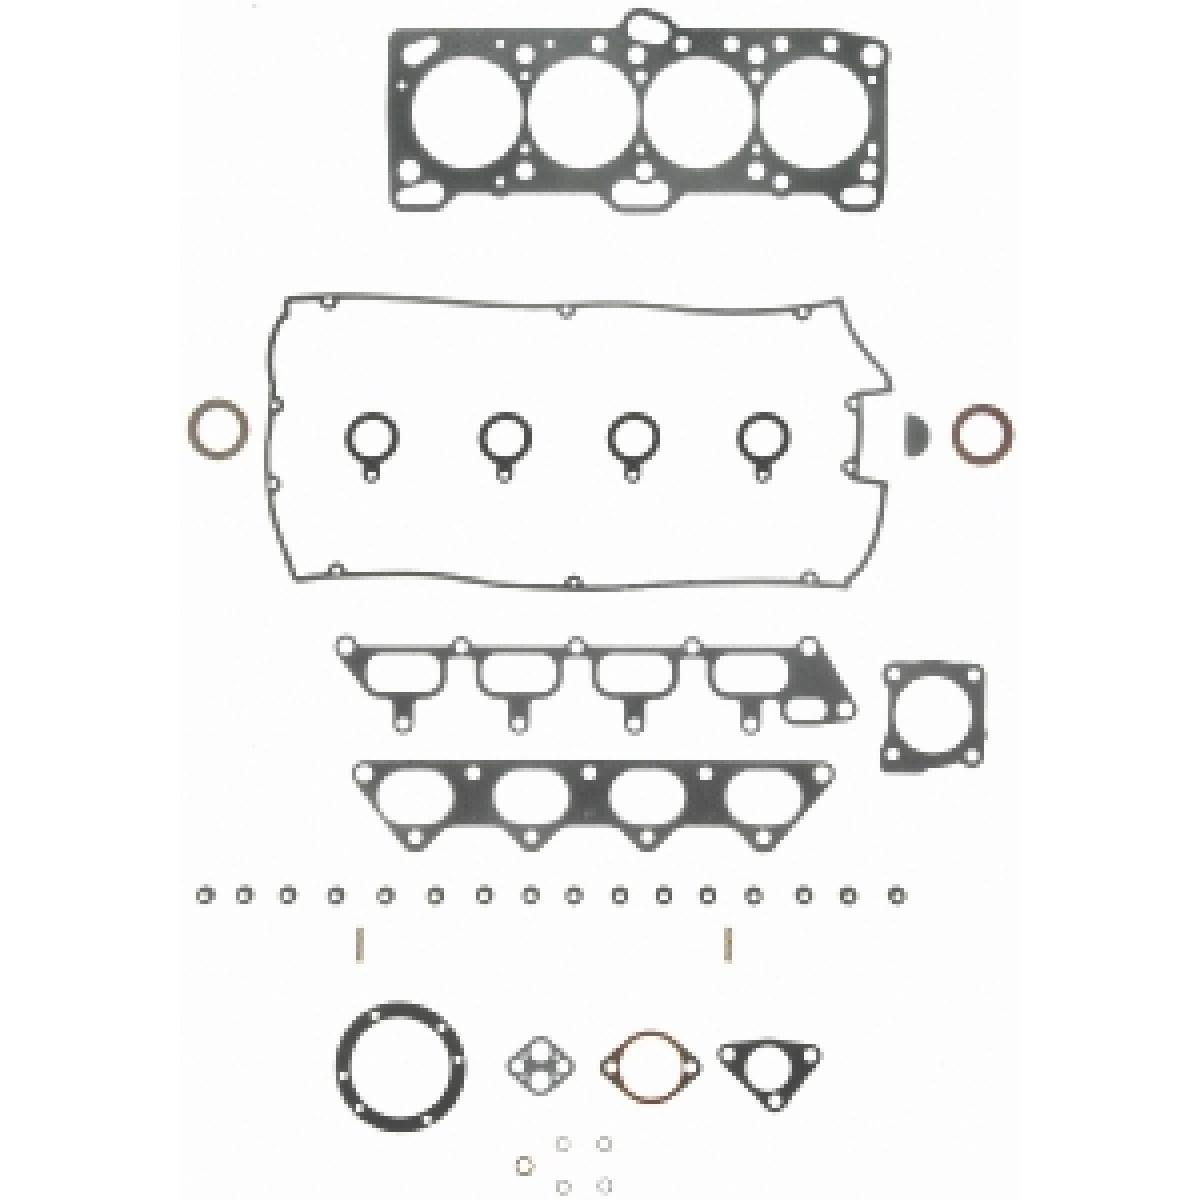 Engine Head Gasket Set For Eclipse Talon 2.0L Turbo 4G63